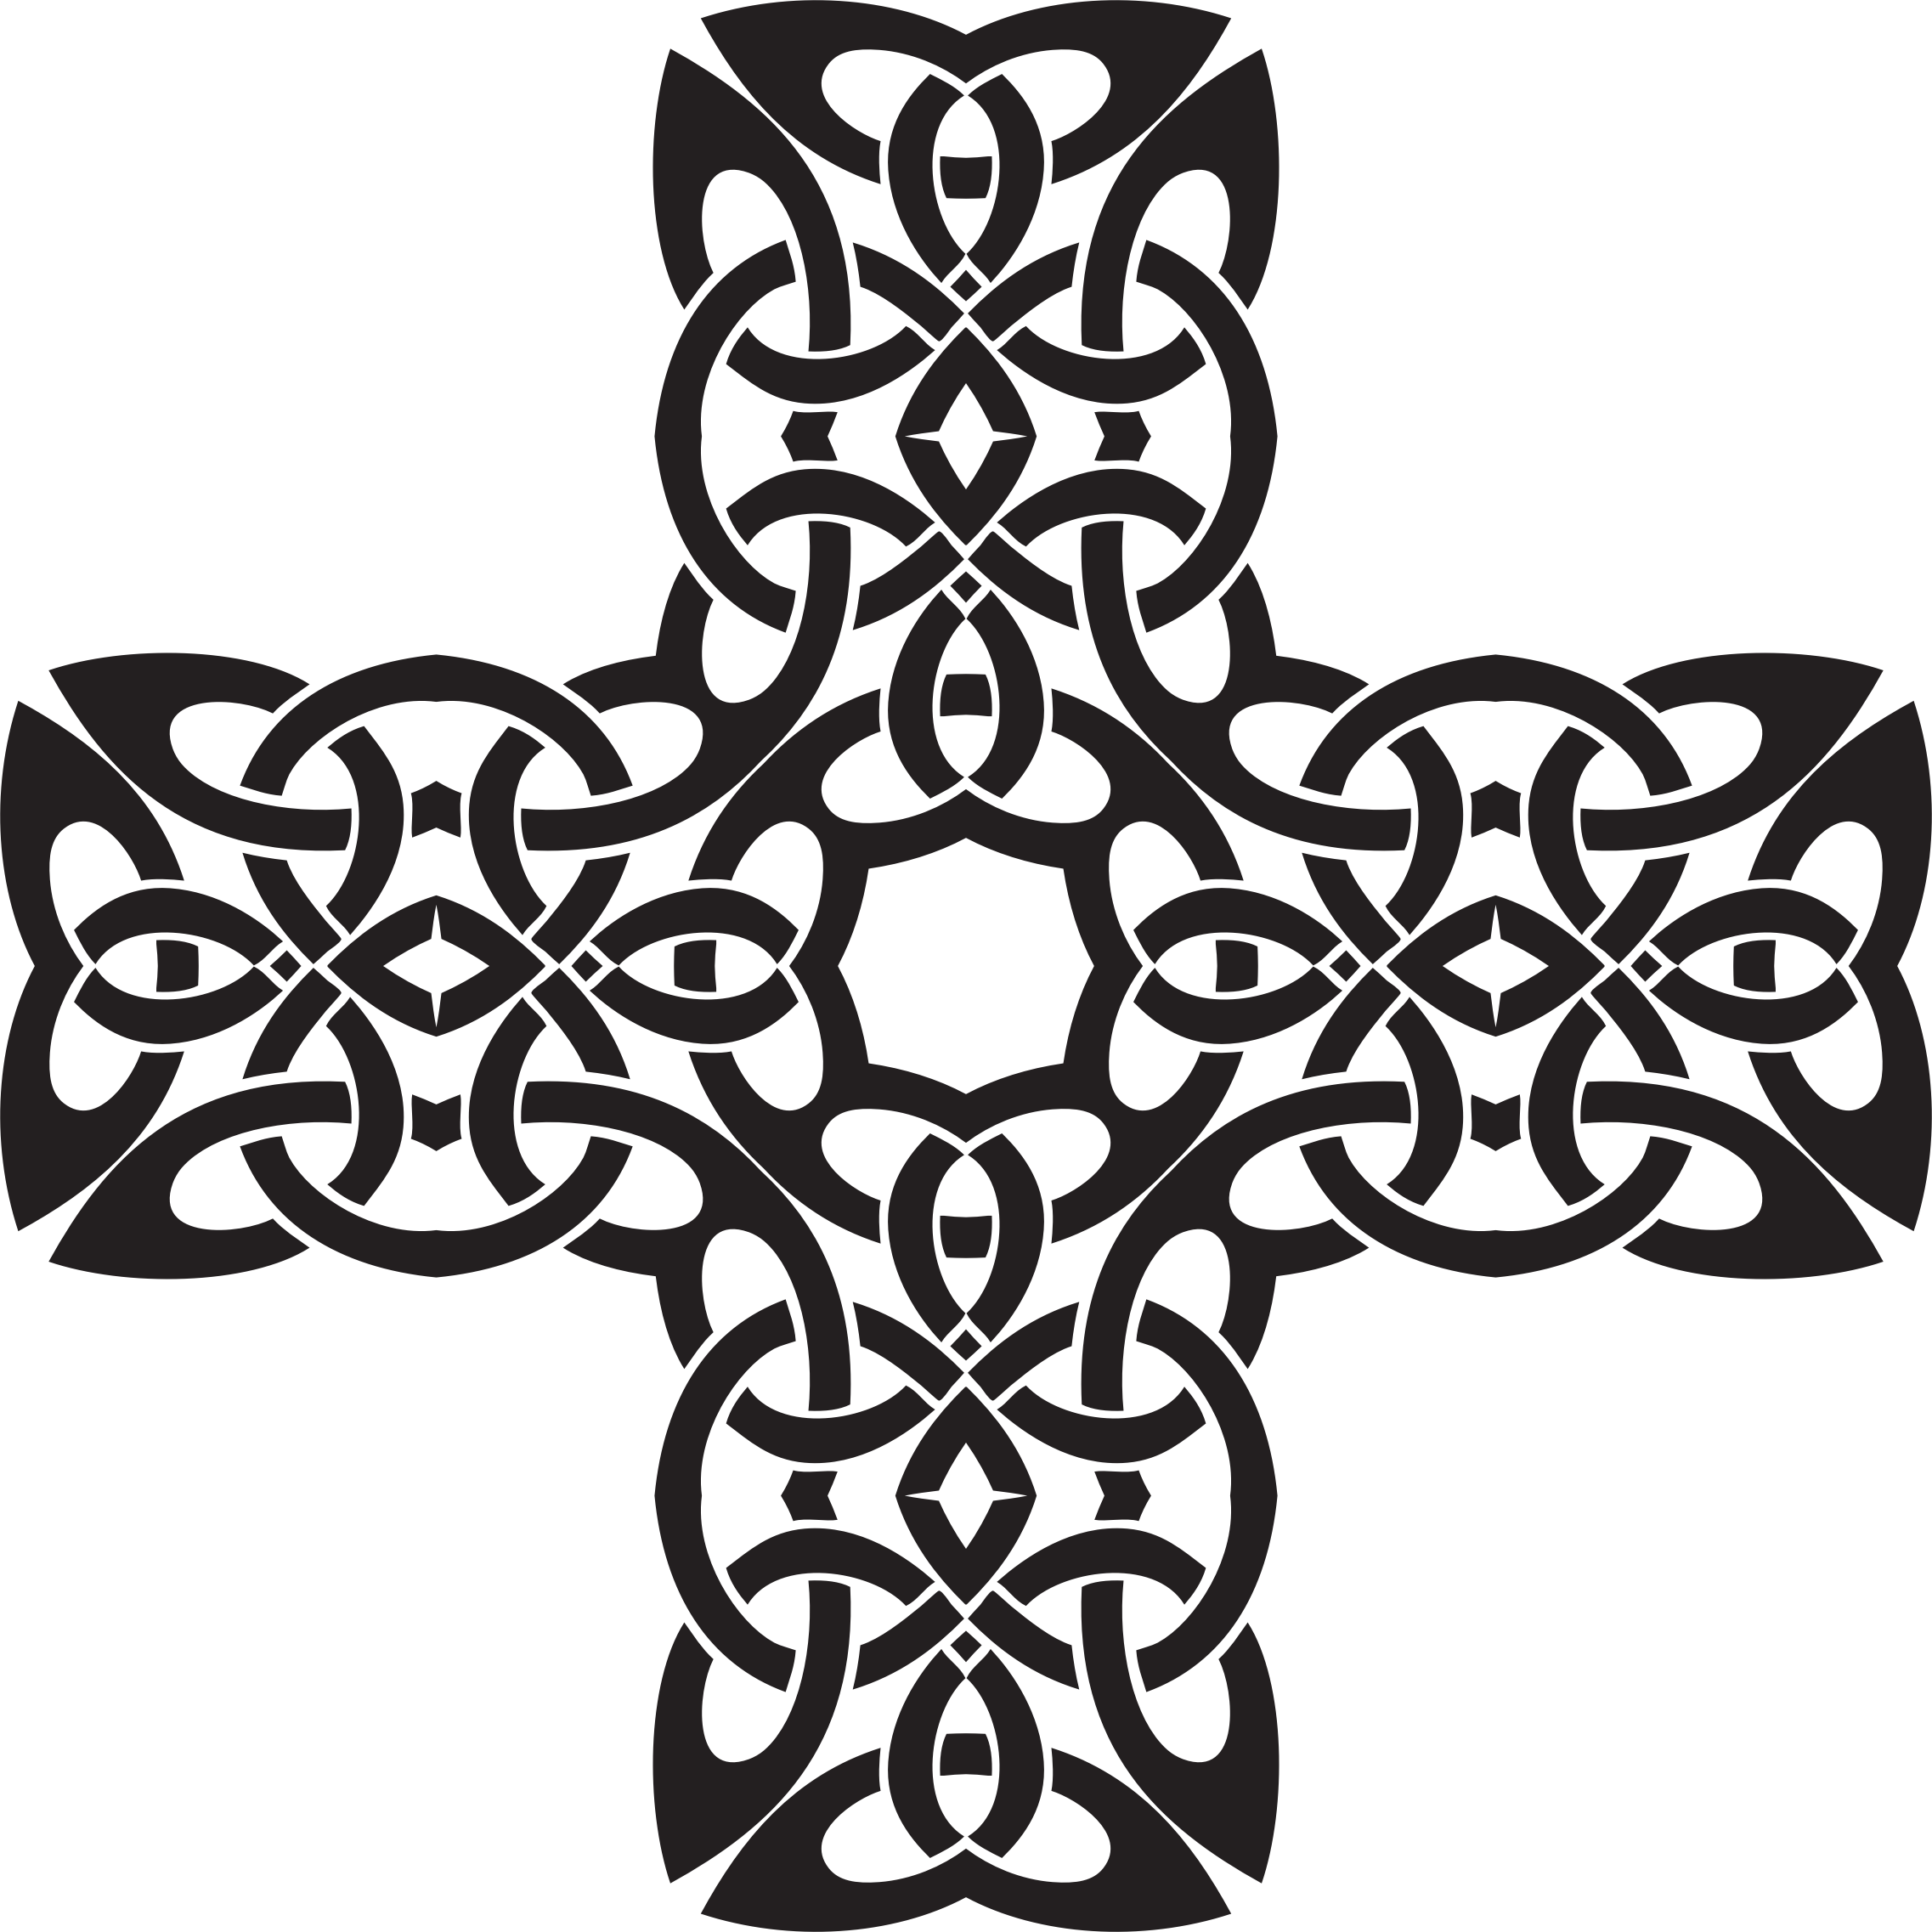 Celtic Knot PNG - 4215